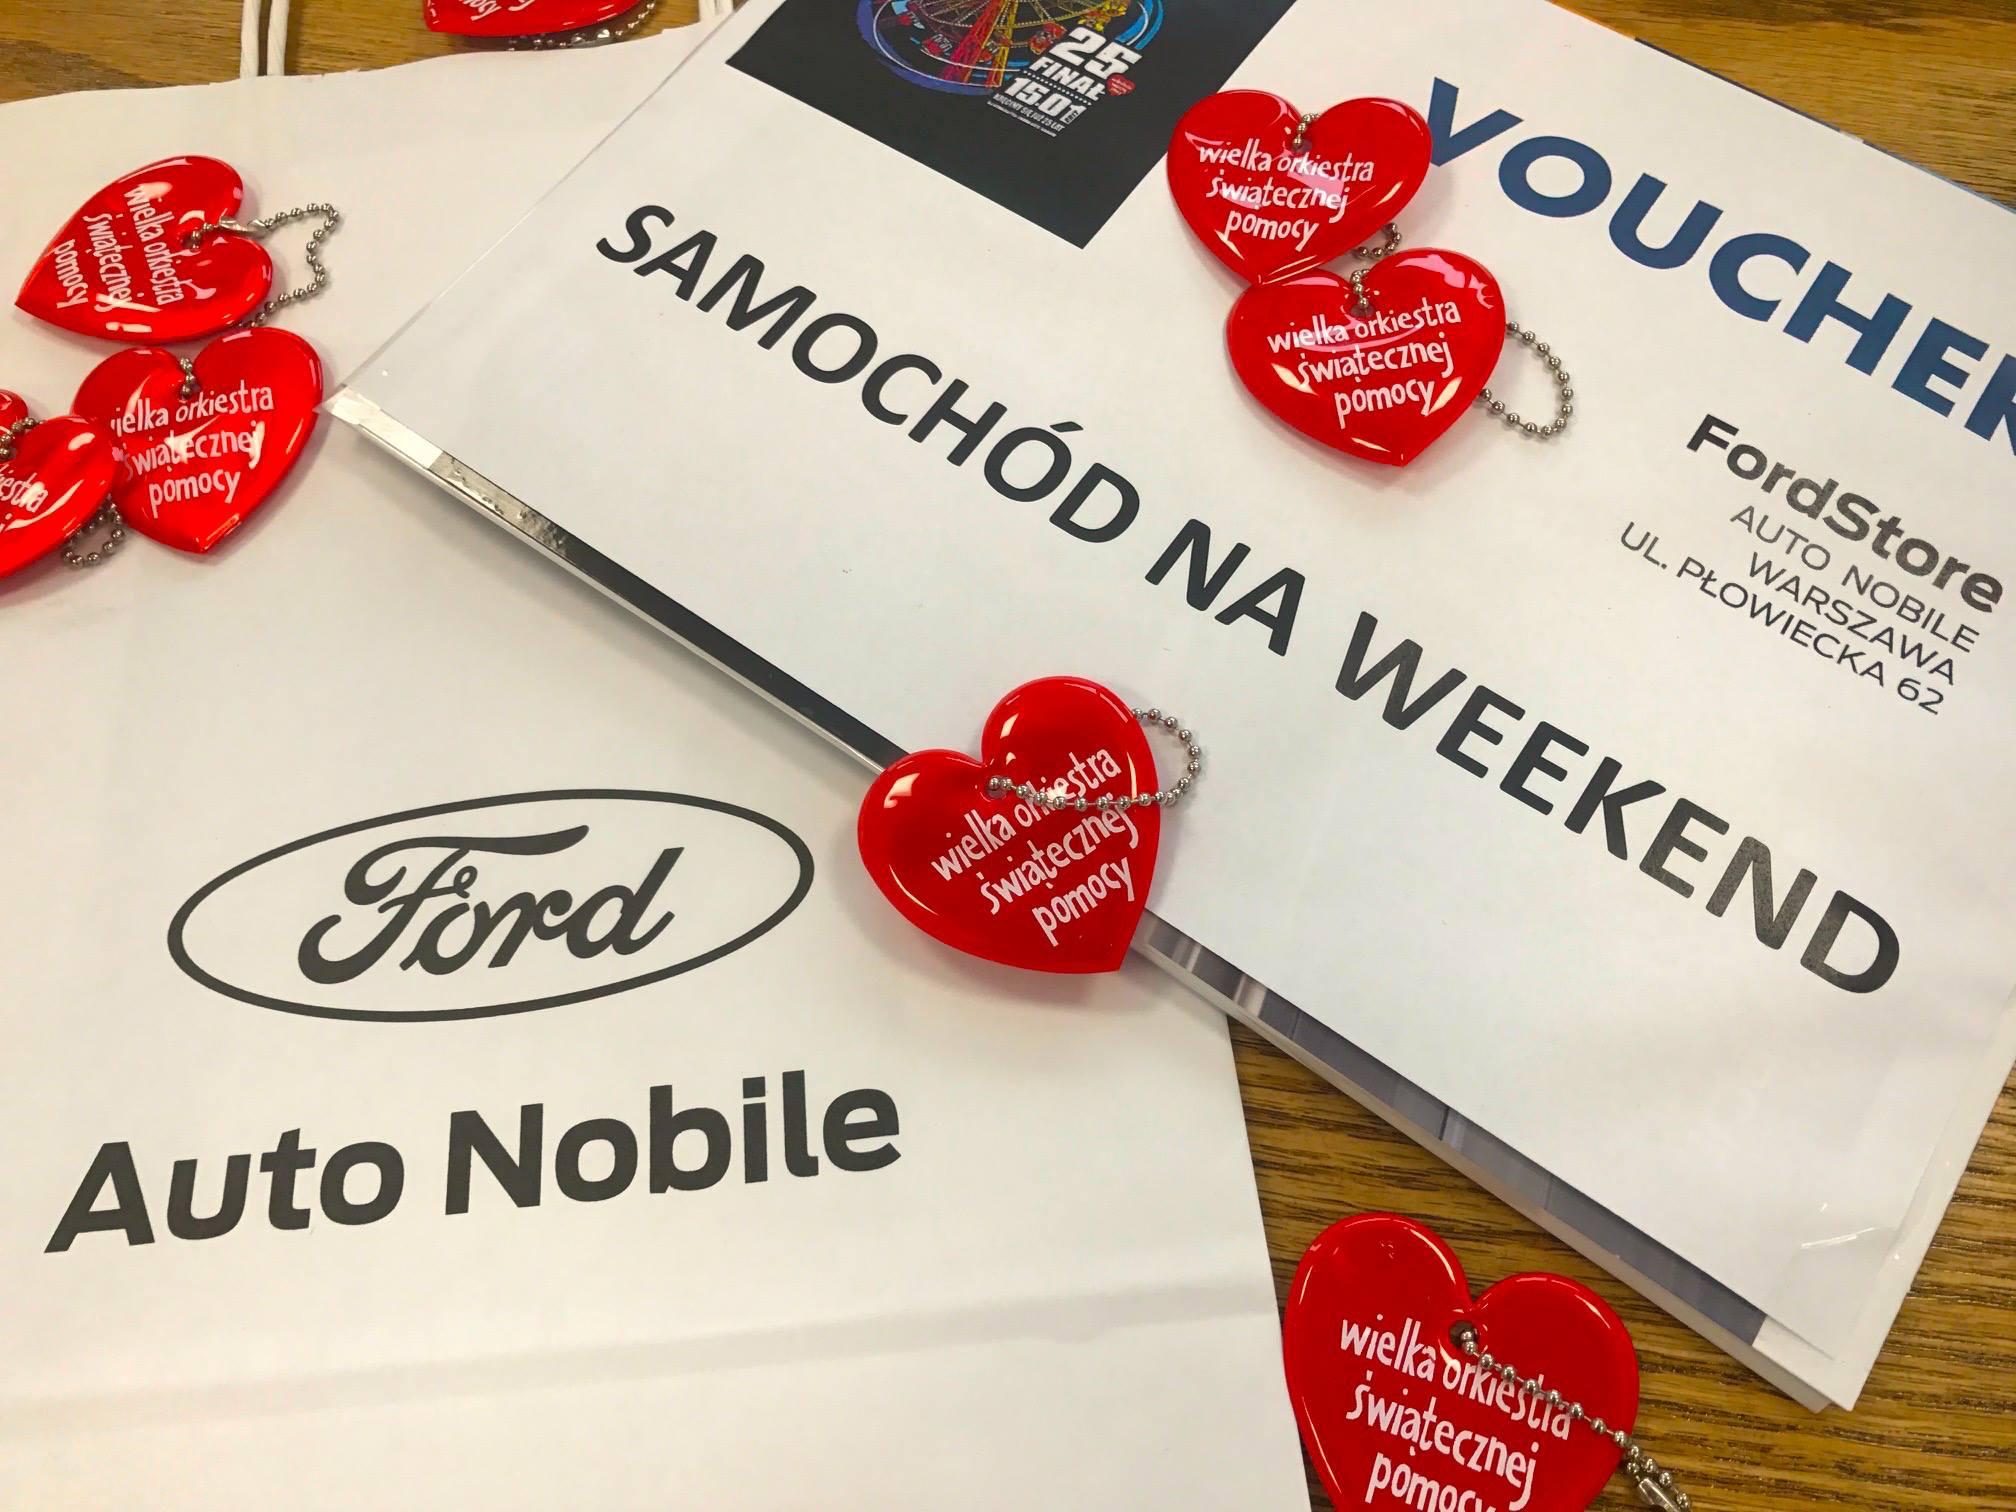 Samochód na weekend od Auto Nobile FORD – LICYTUJCIE!